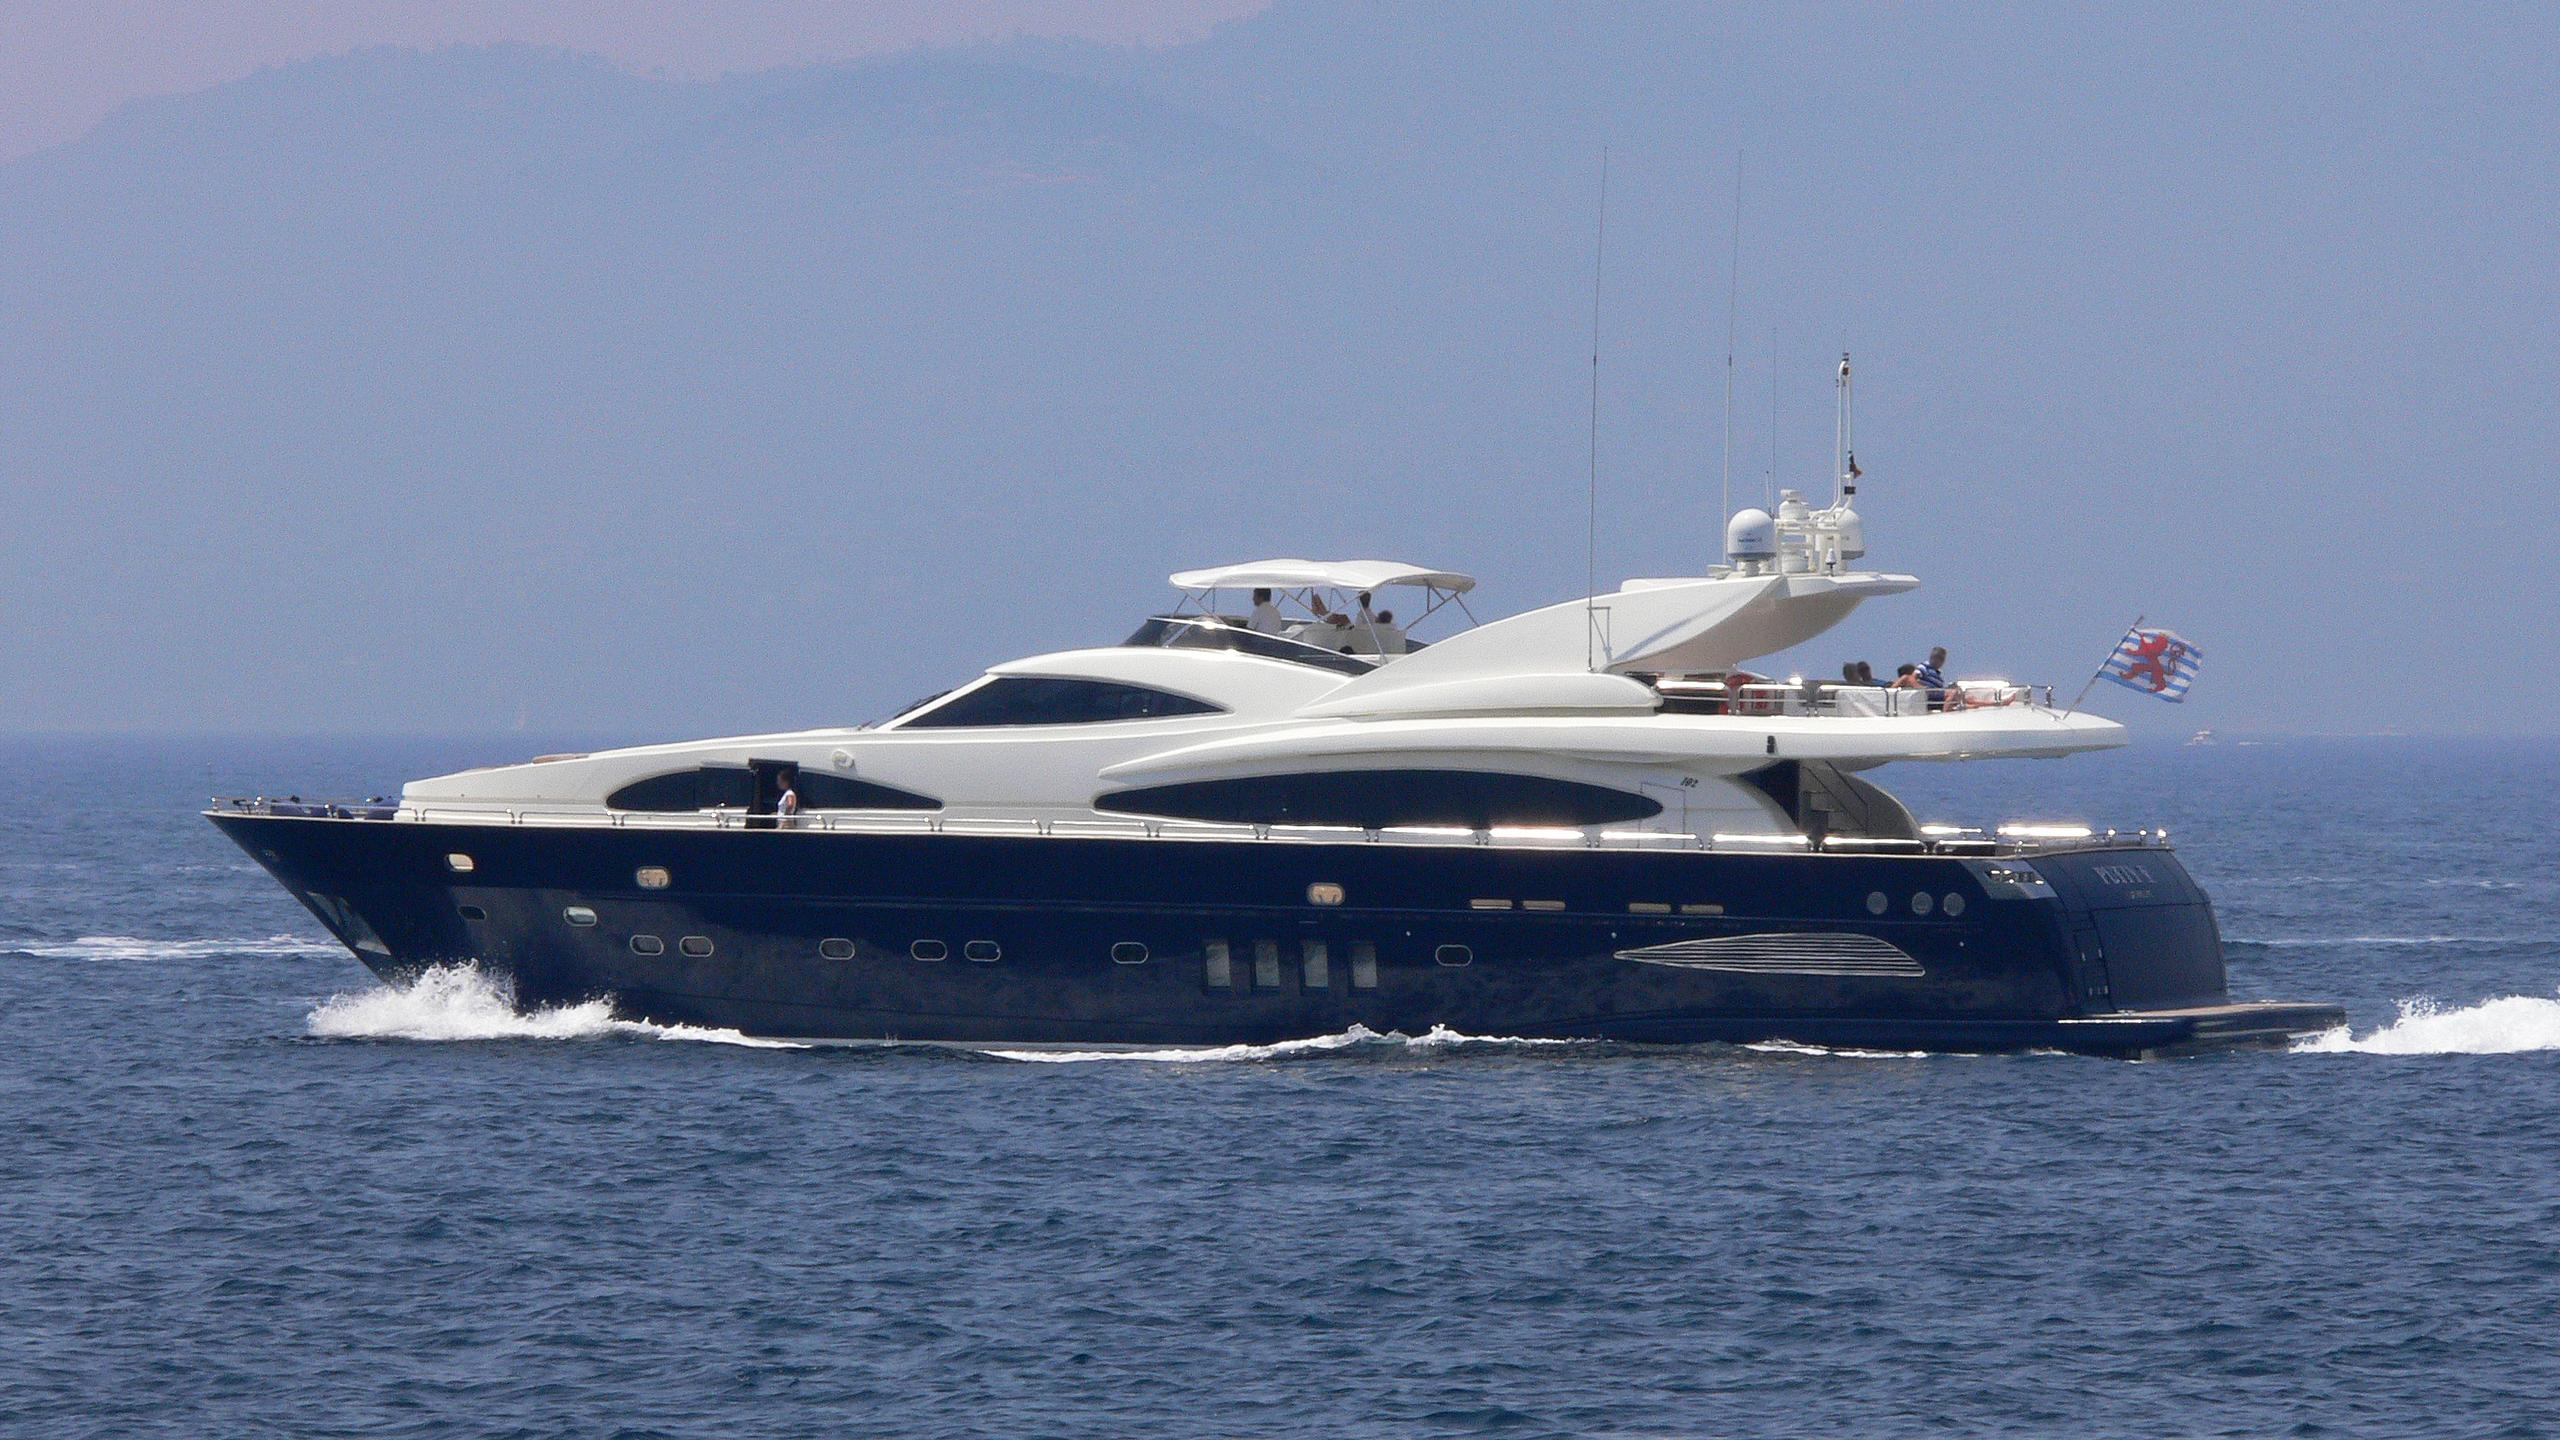 lulu-celtic-dawn-yacht-exterior